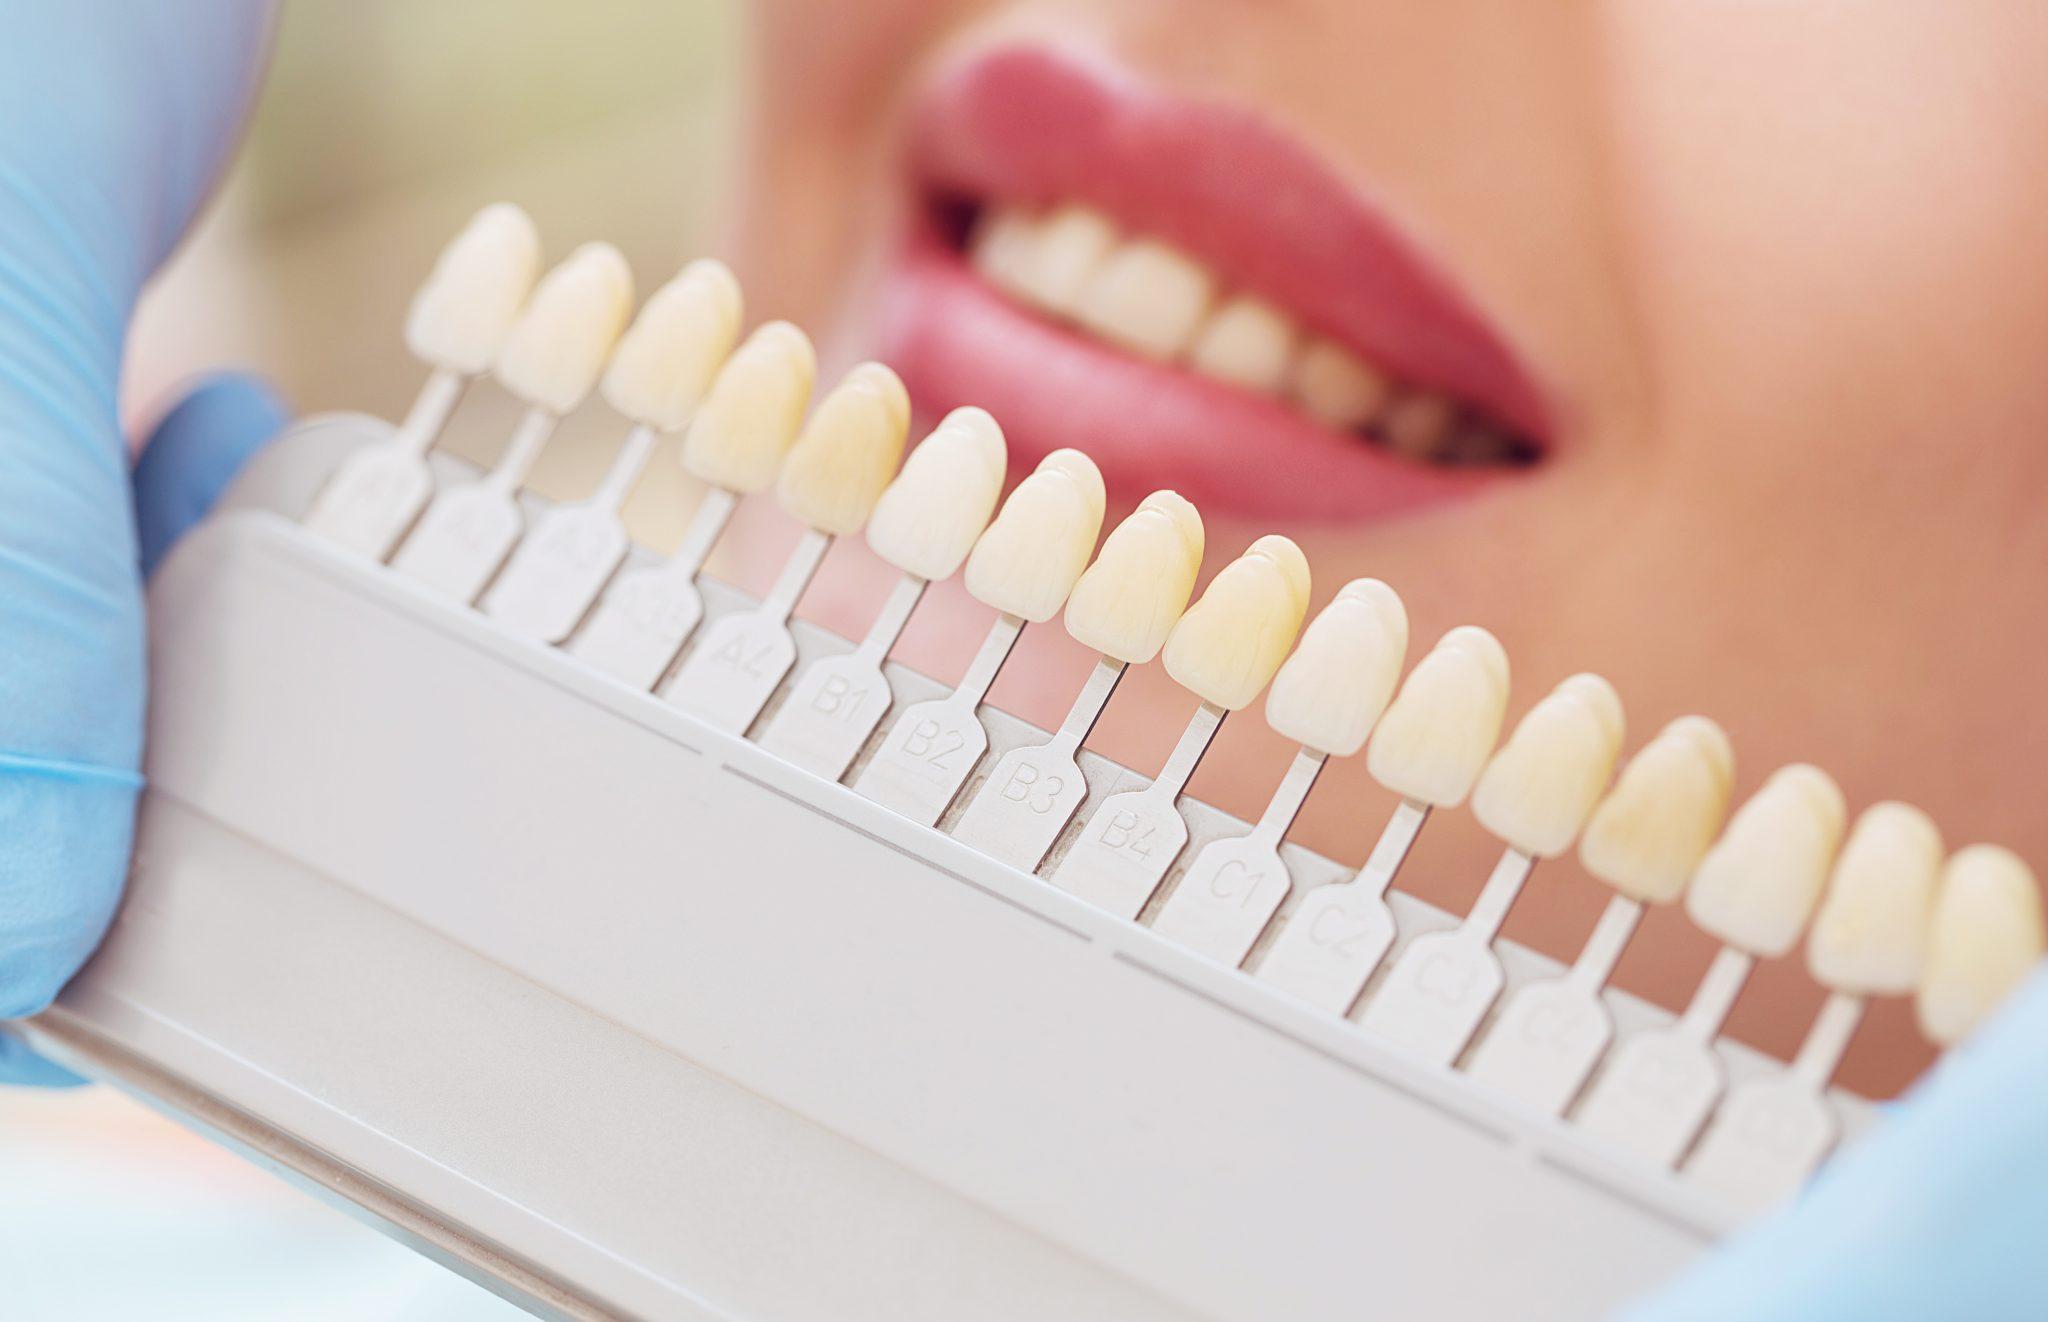 Dental laminates and veneers